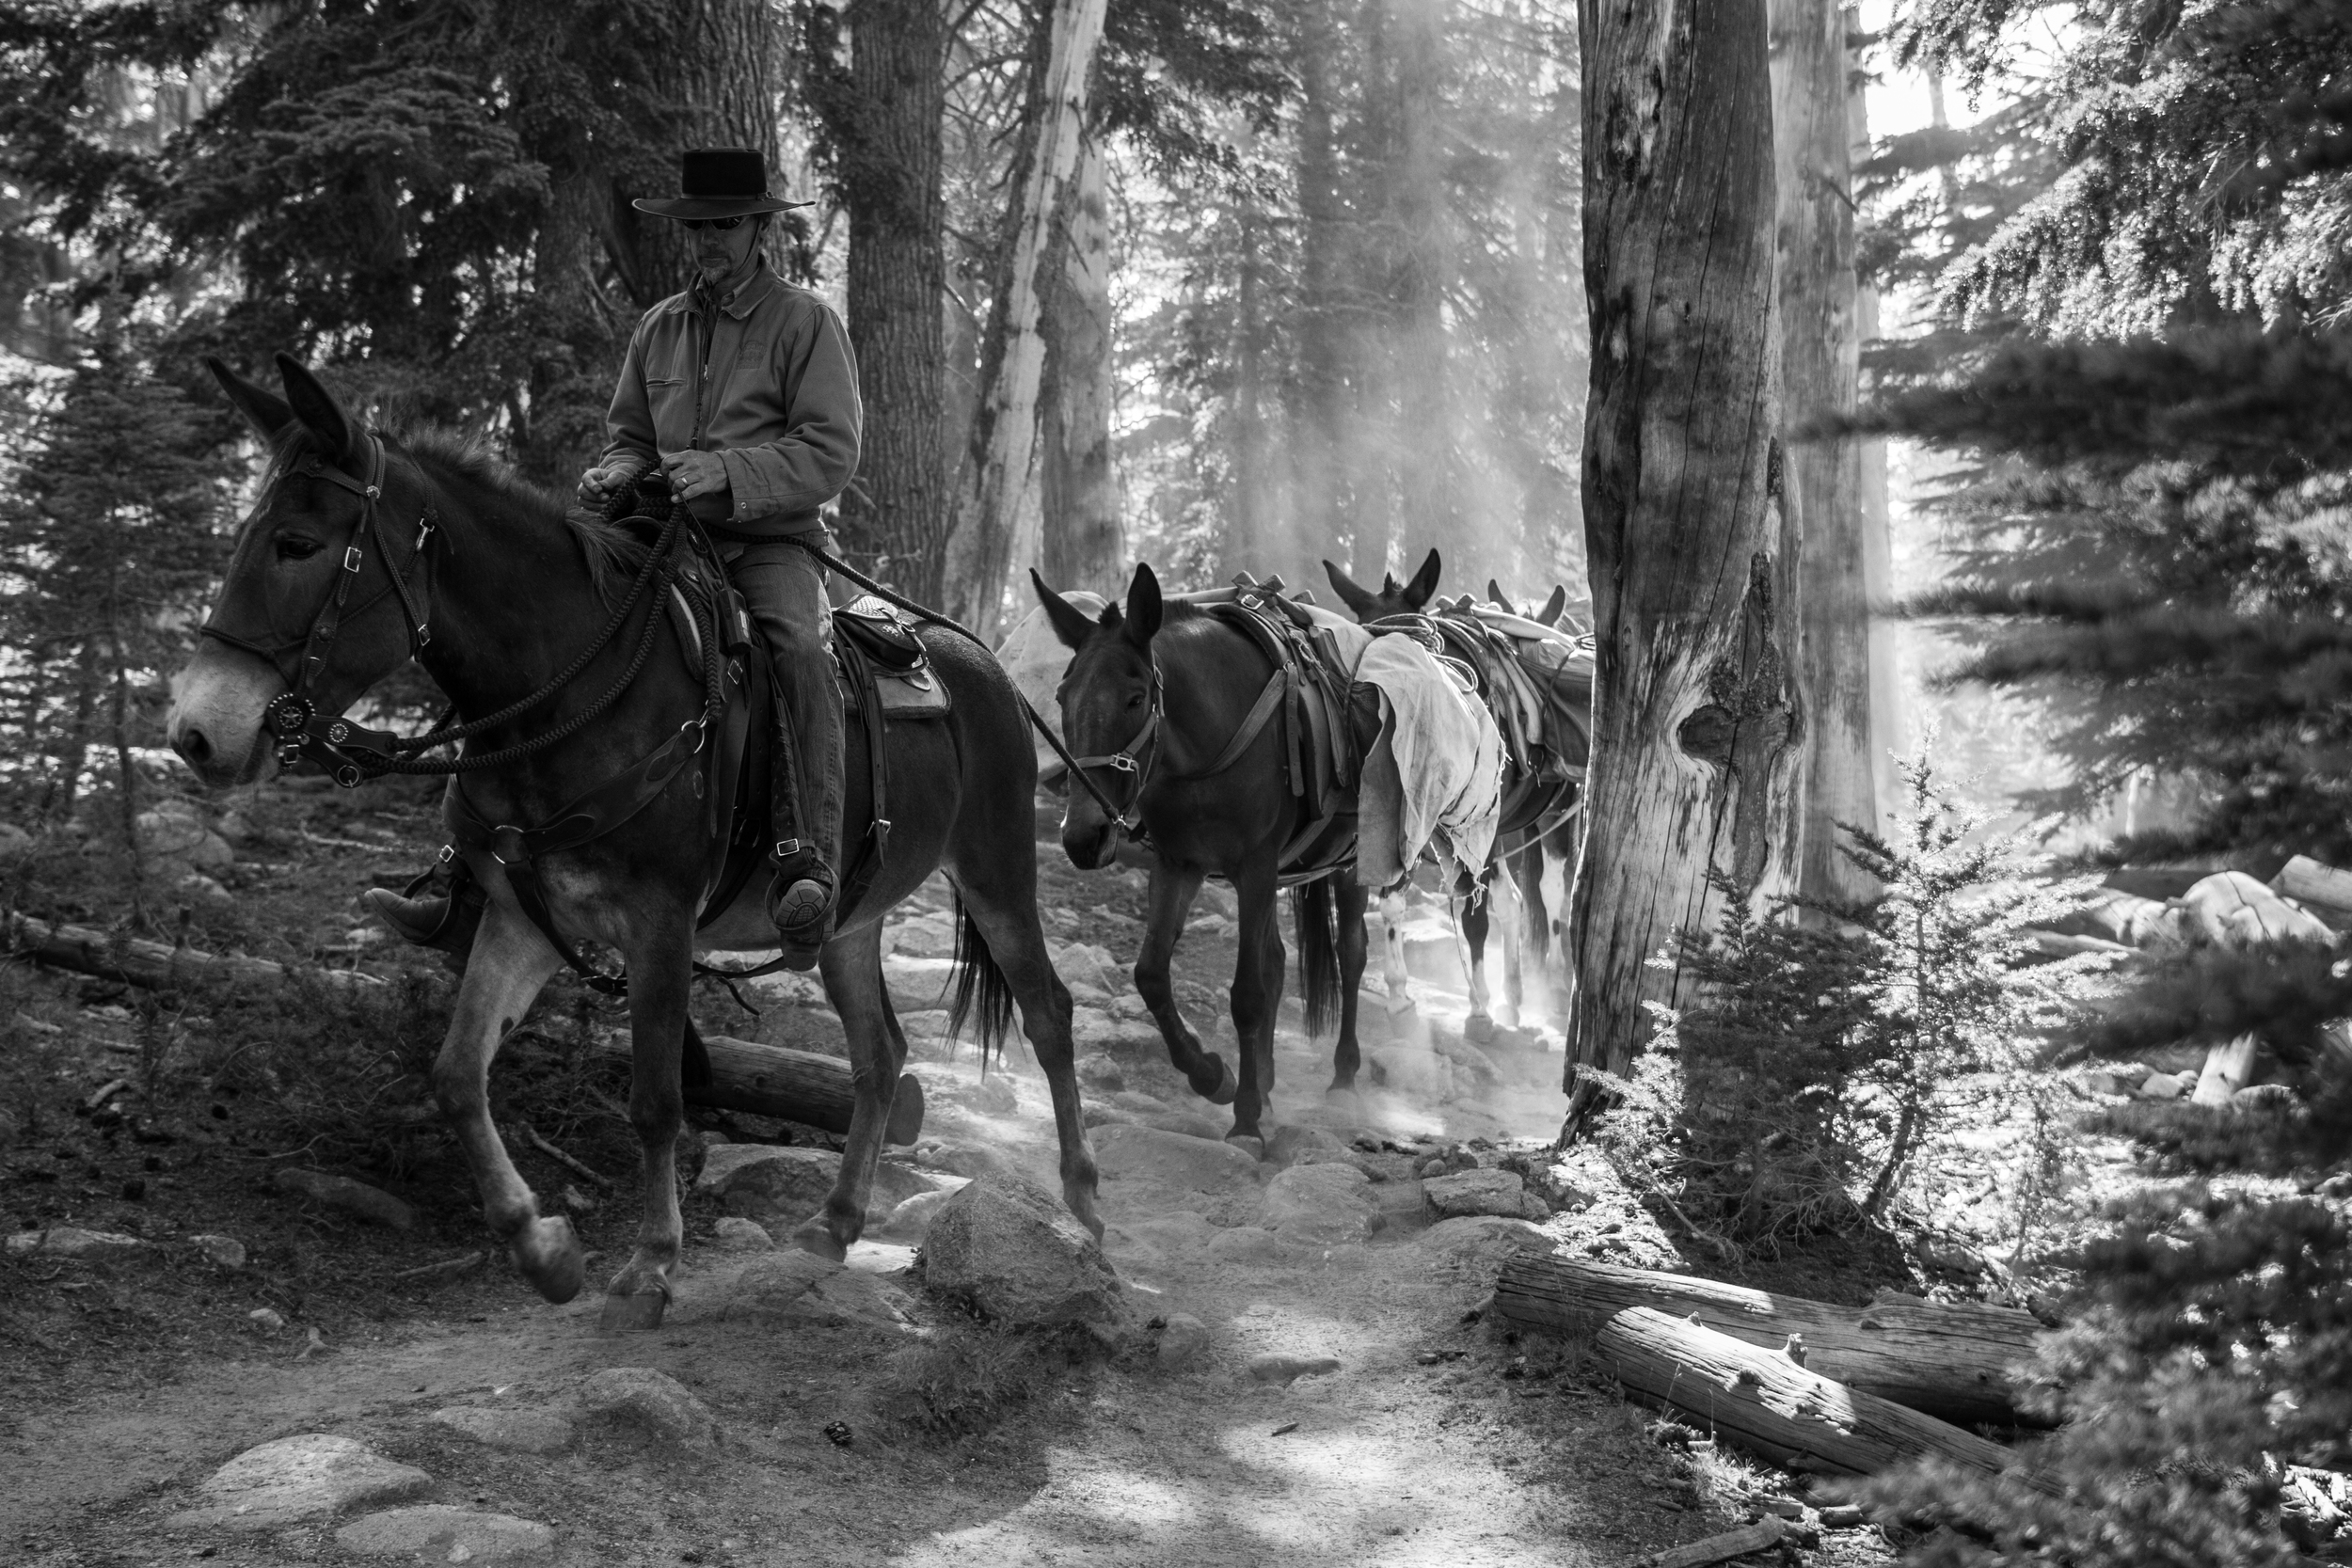 Tuolumne Meadows, Yosemite NP, CA